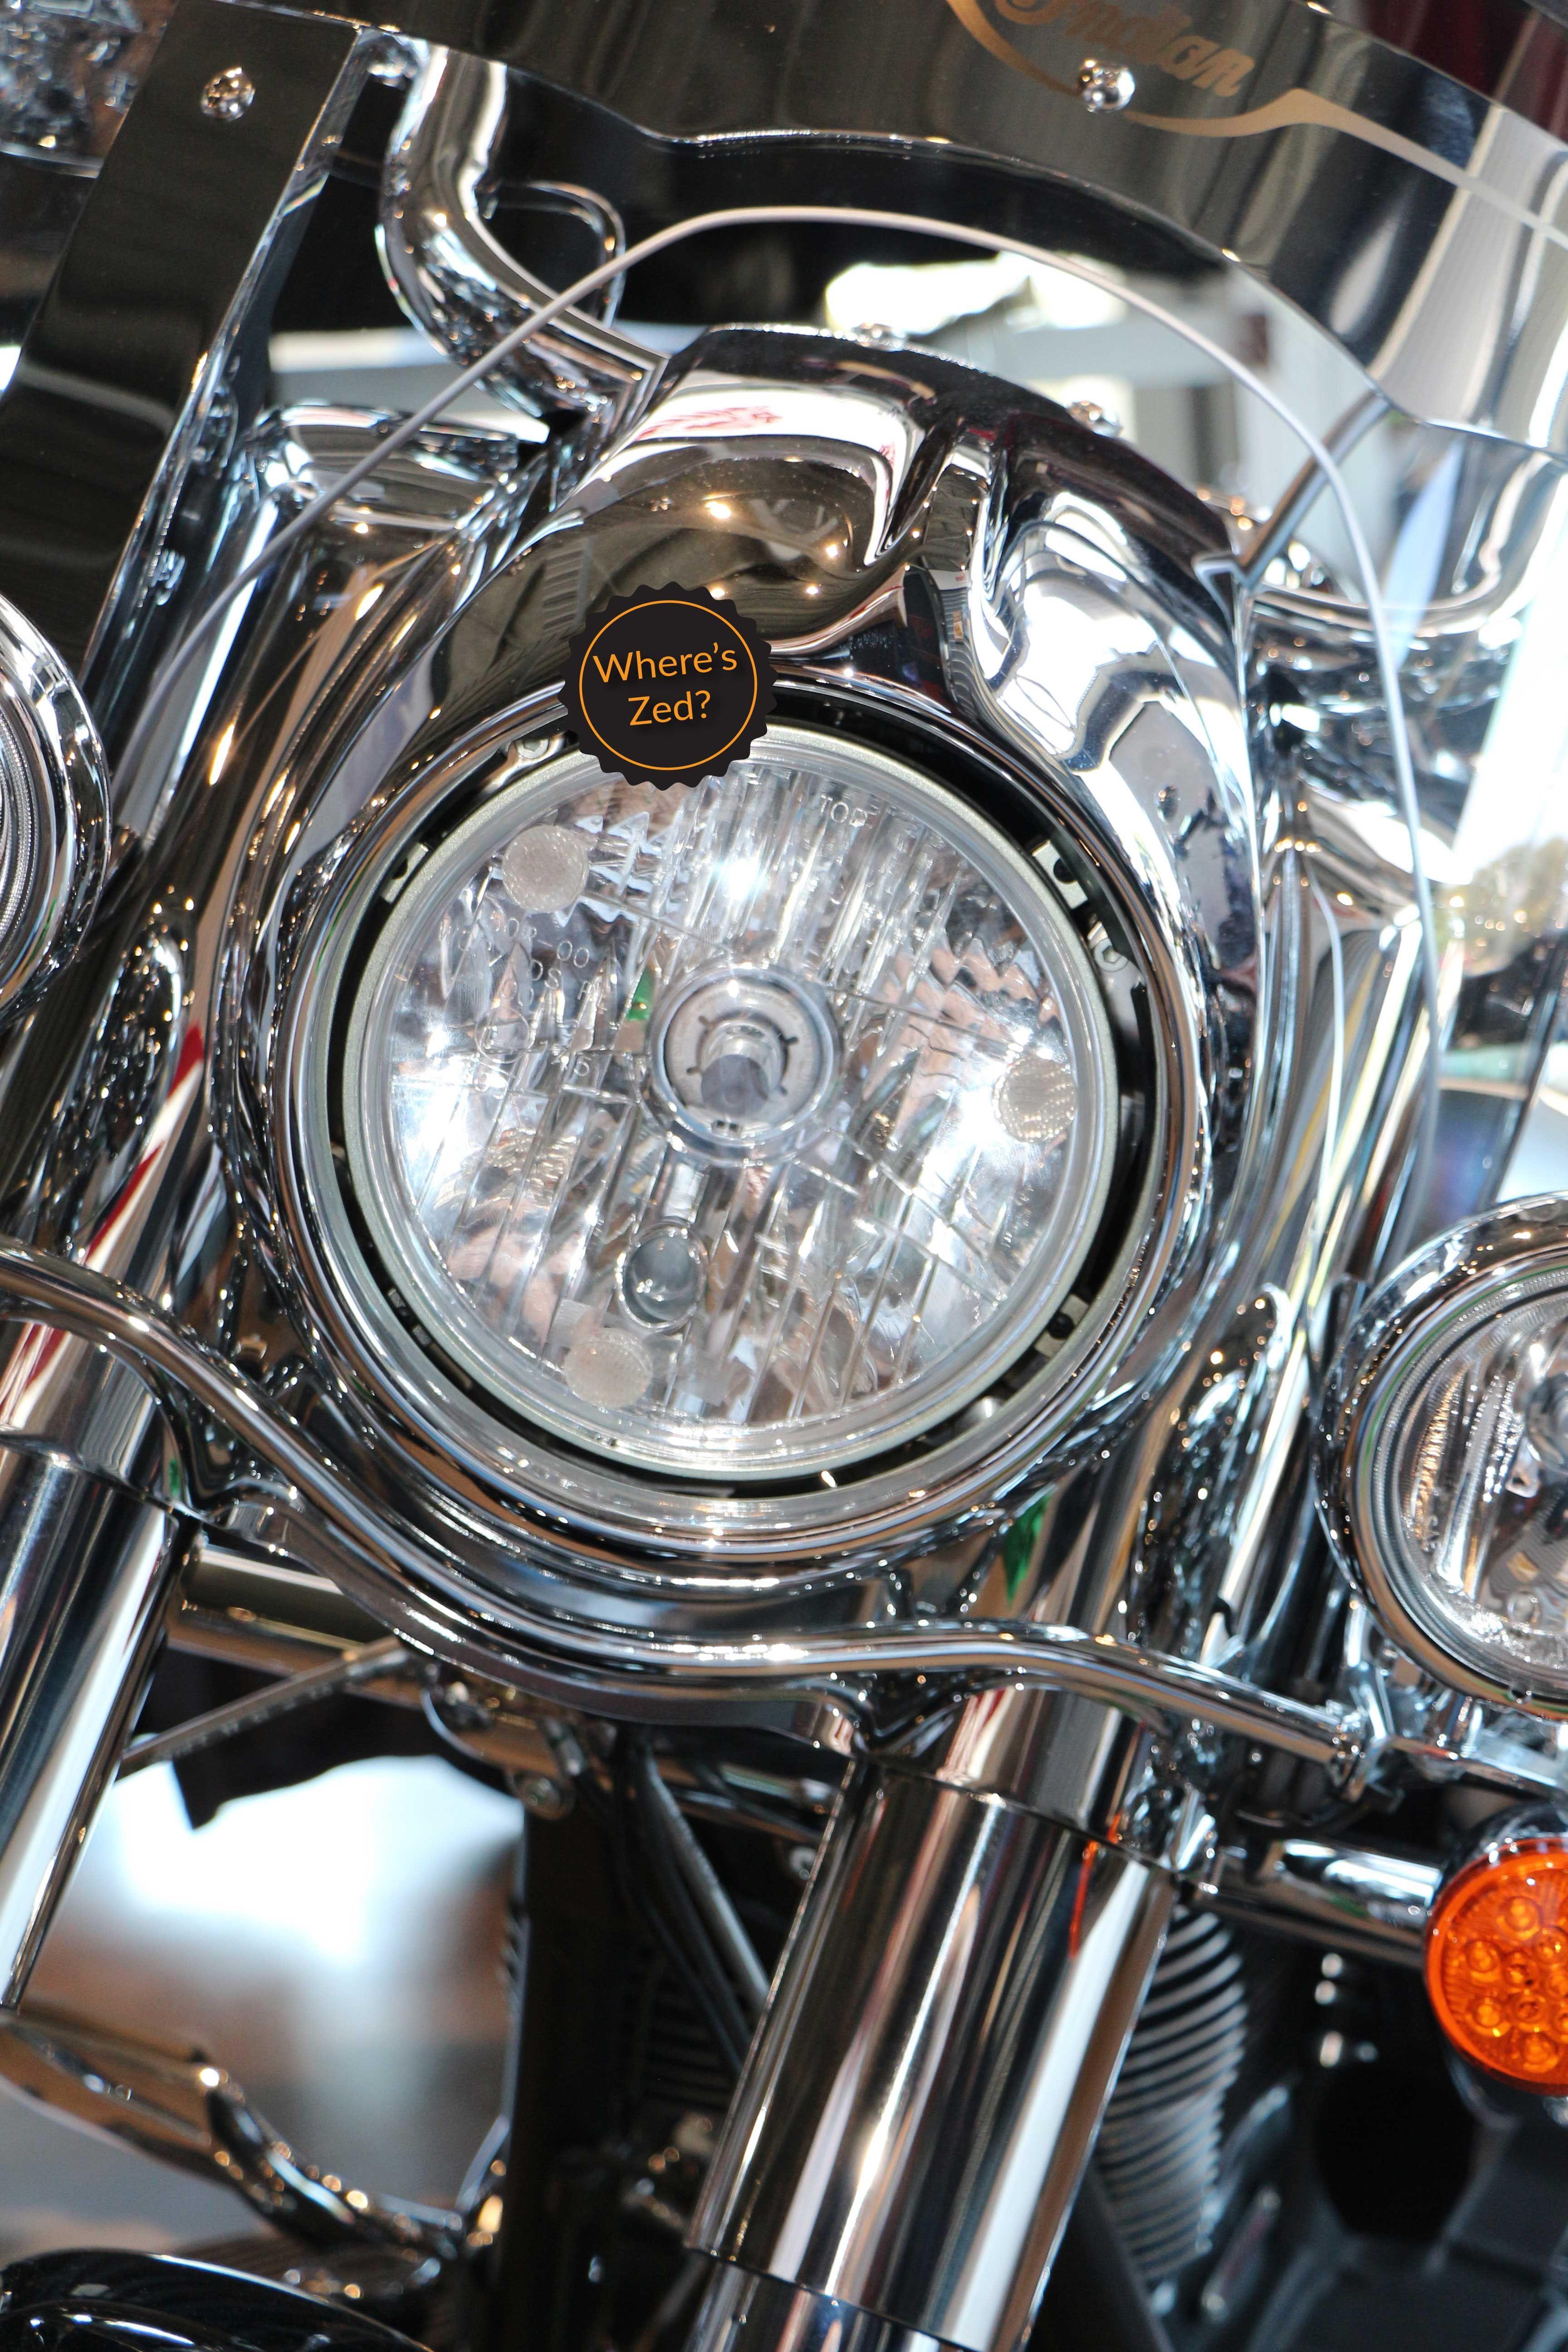 Chieftan Springfield Vintage Motorcycle Headlight Protector